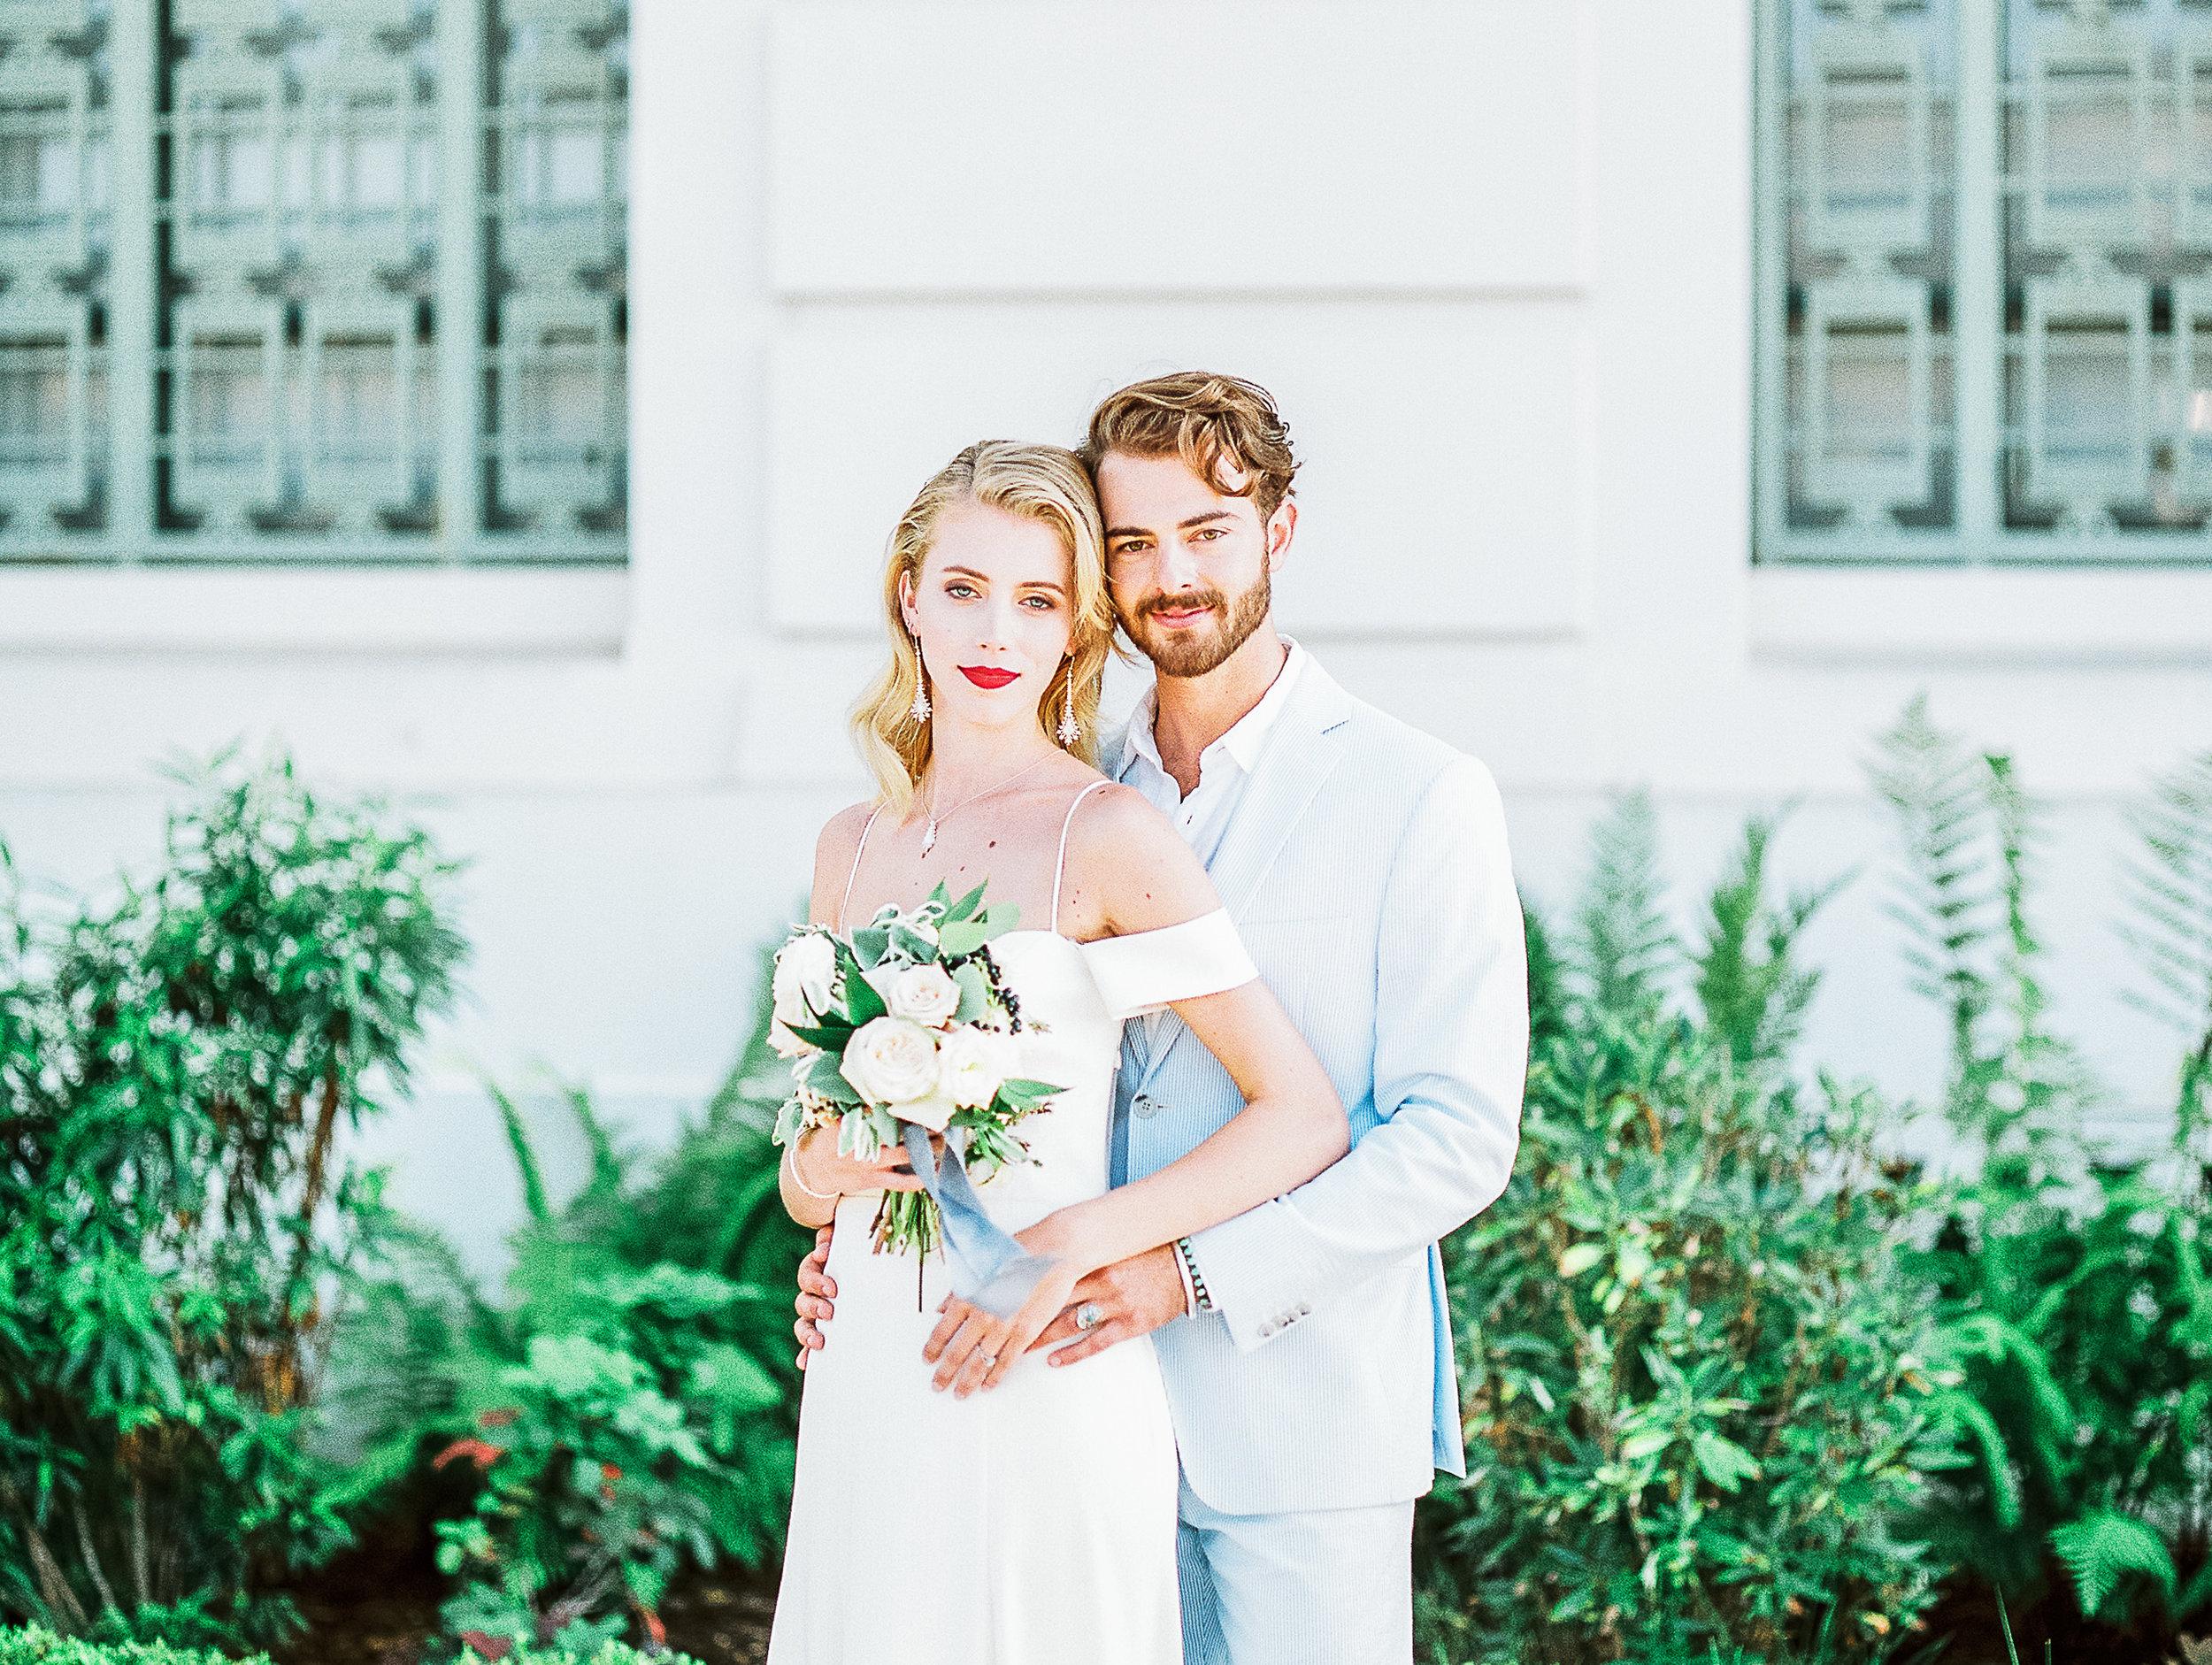 LA-Wedding-Shoot-by-JBJ-Pictures-325.jpg